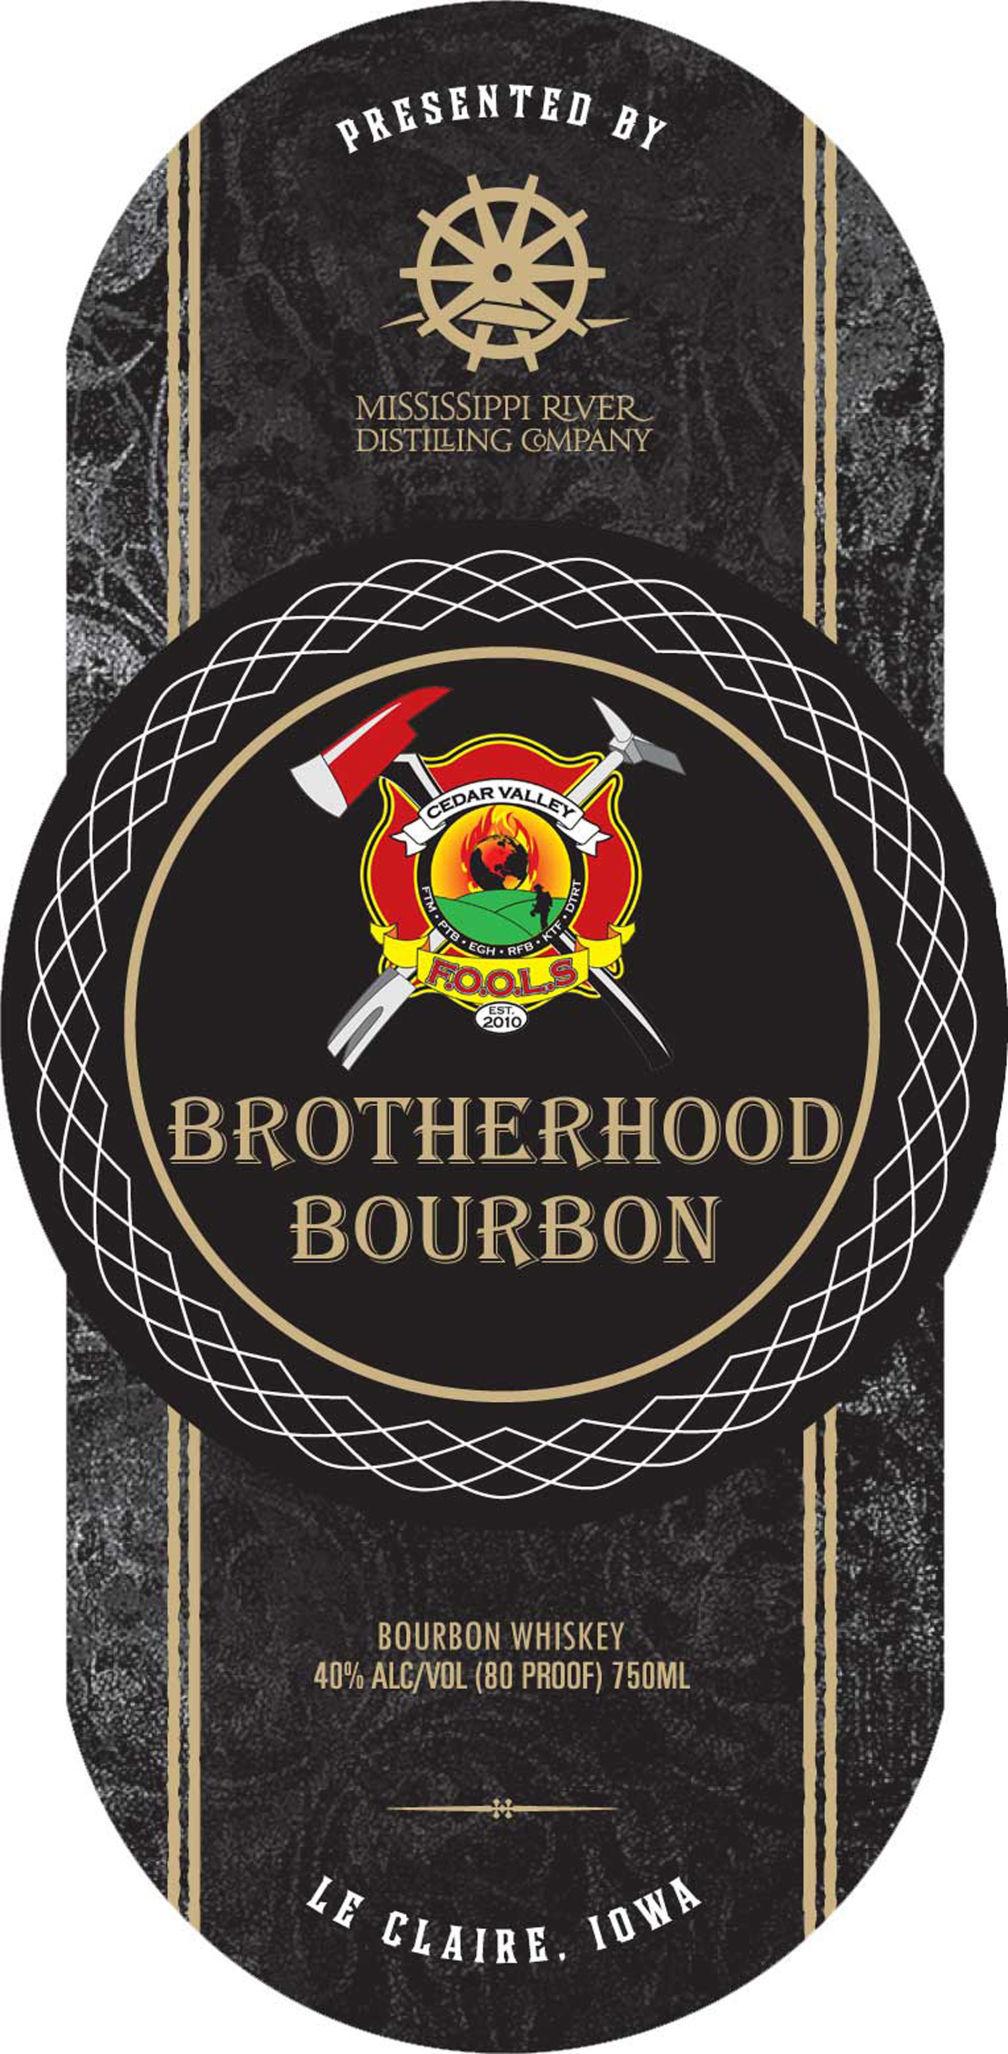 brotherhood-bourbon-label